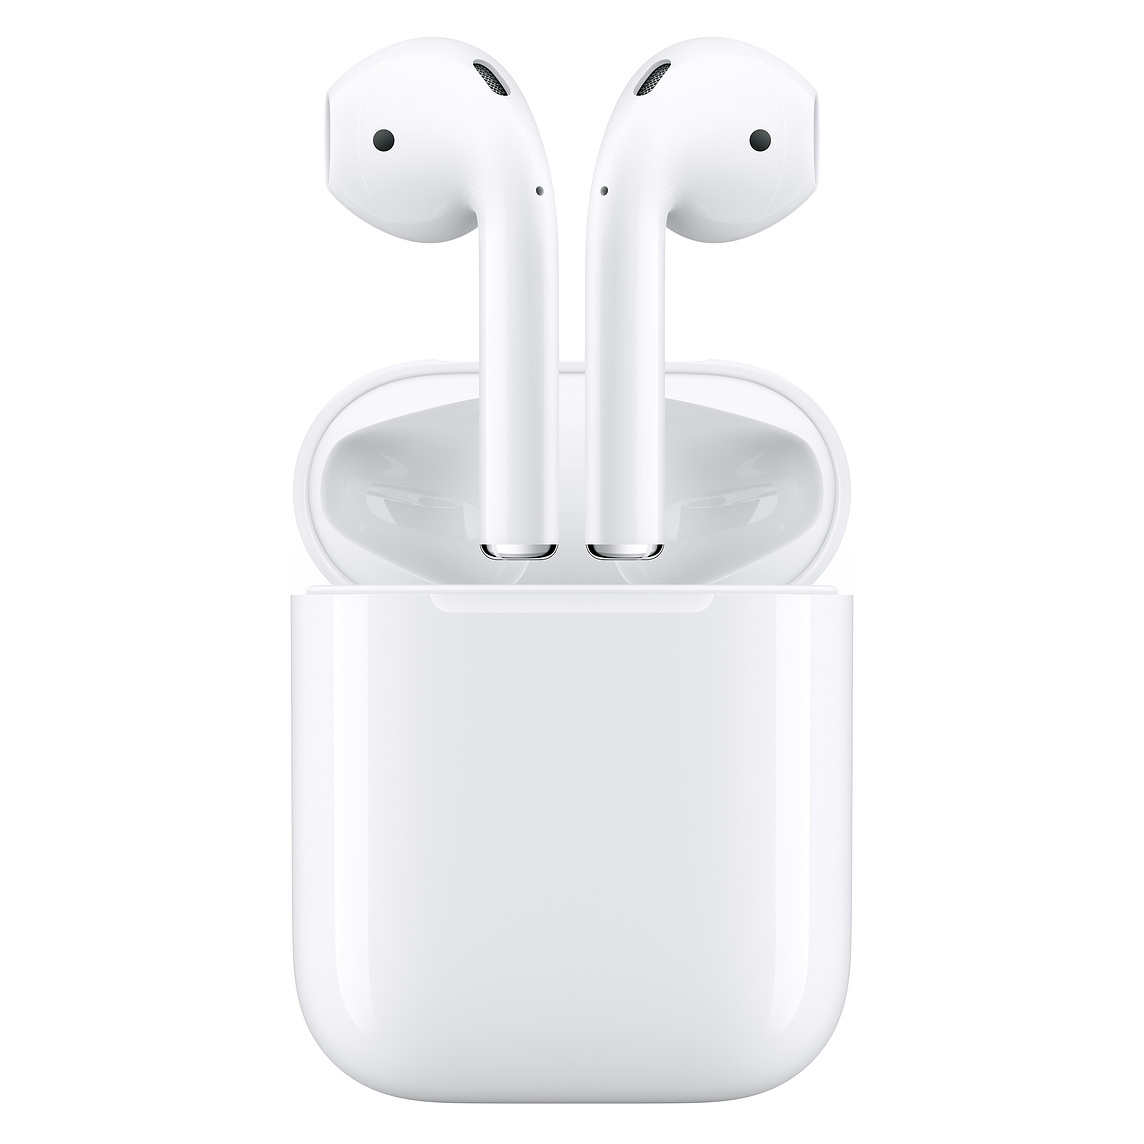 Apple AirPods Wireless Earbuds Headphones